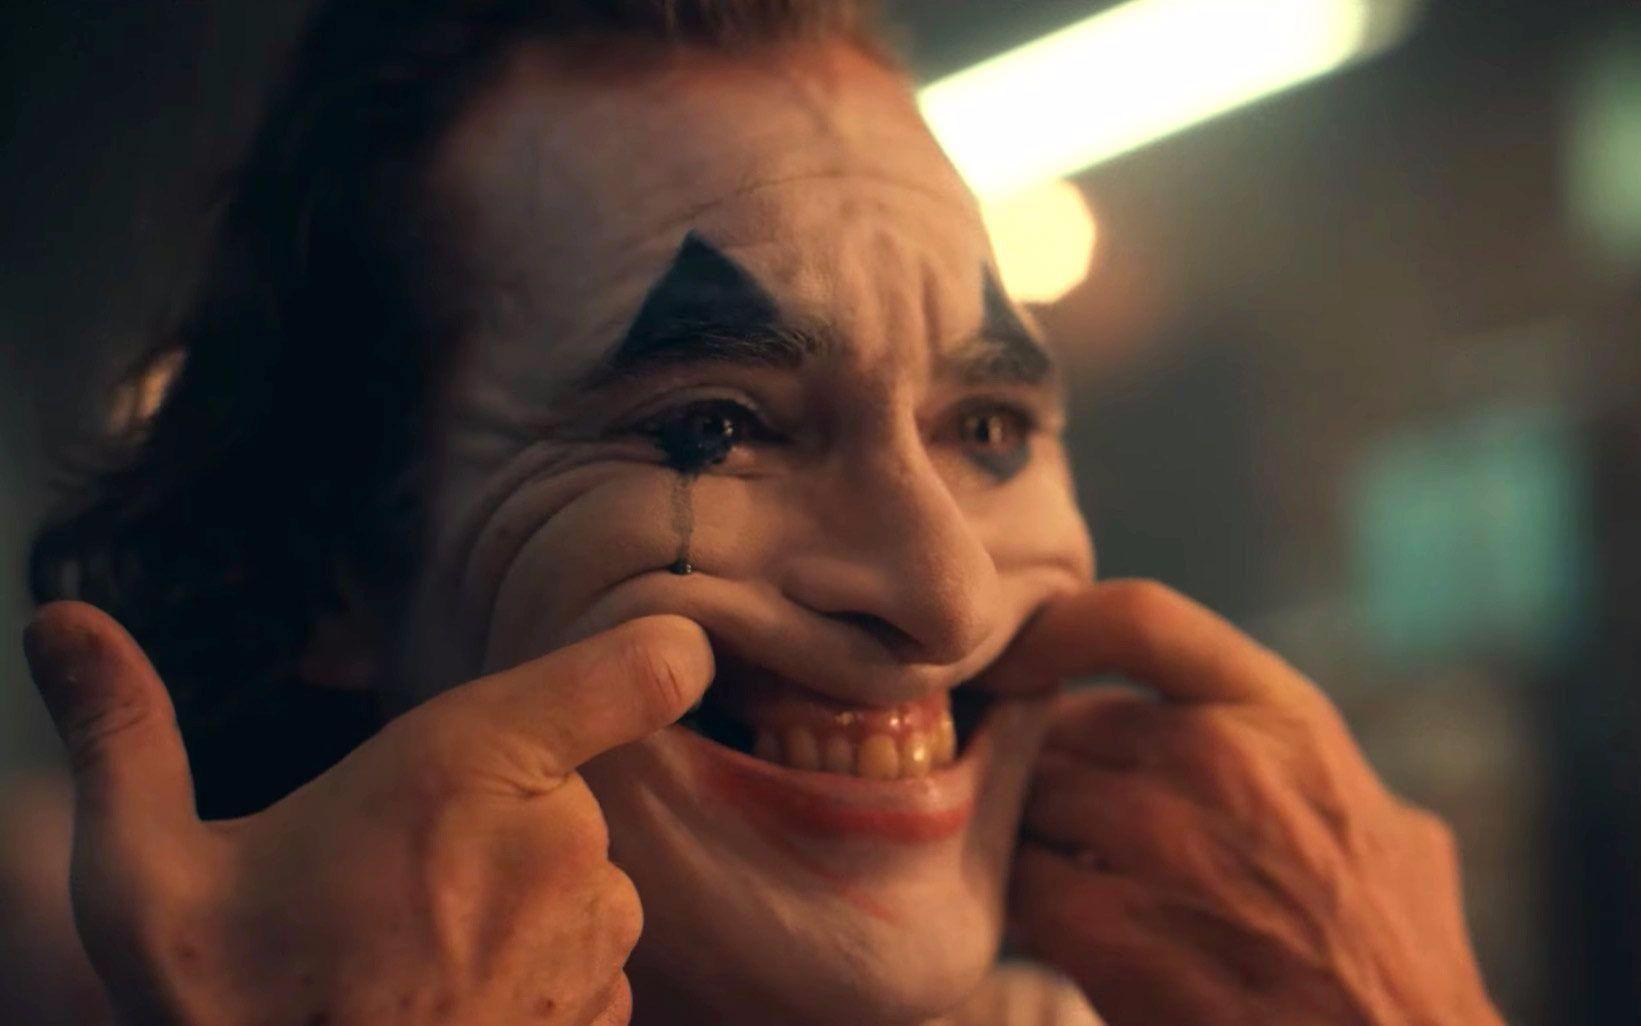 He just wanted to work with Robert De Niro, who is also in Joker.